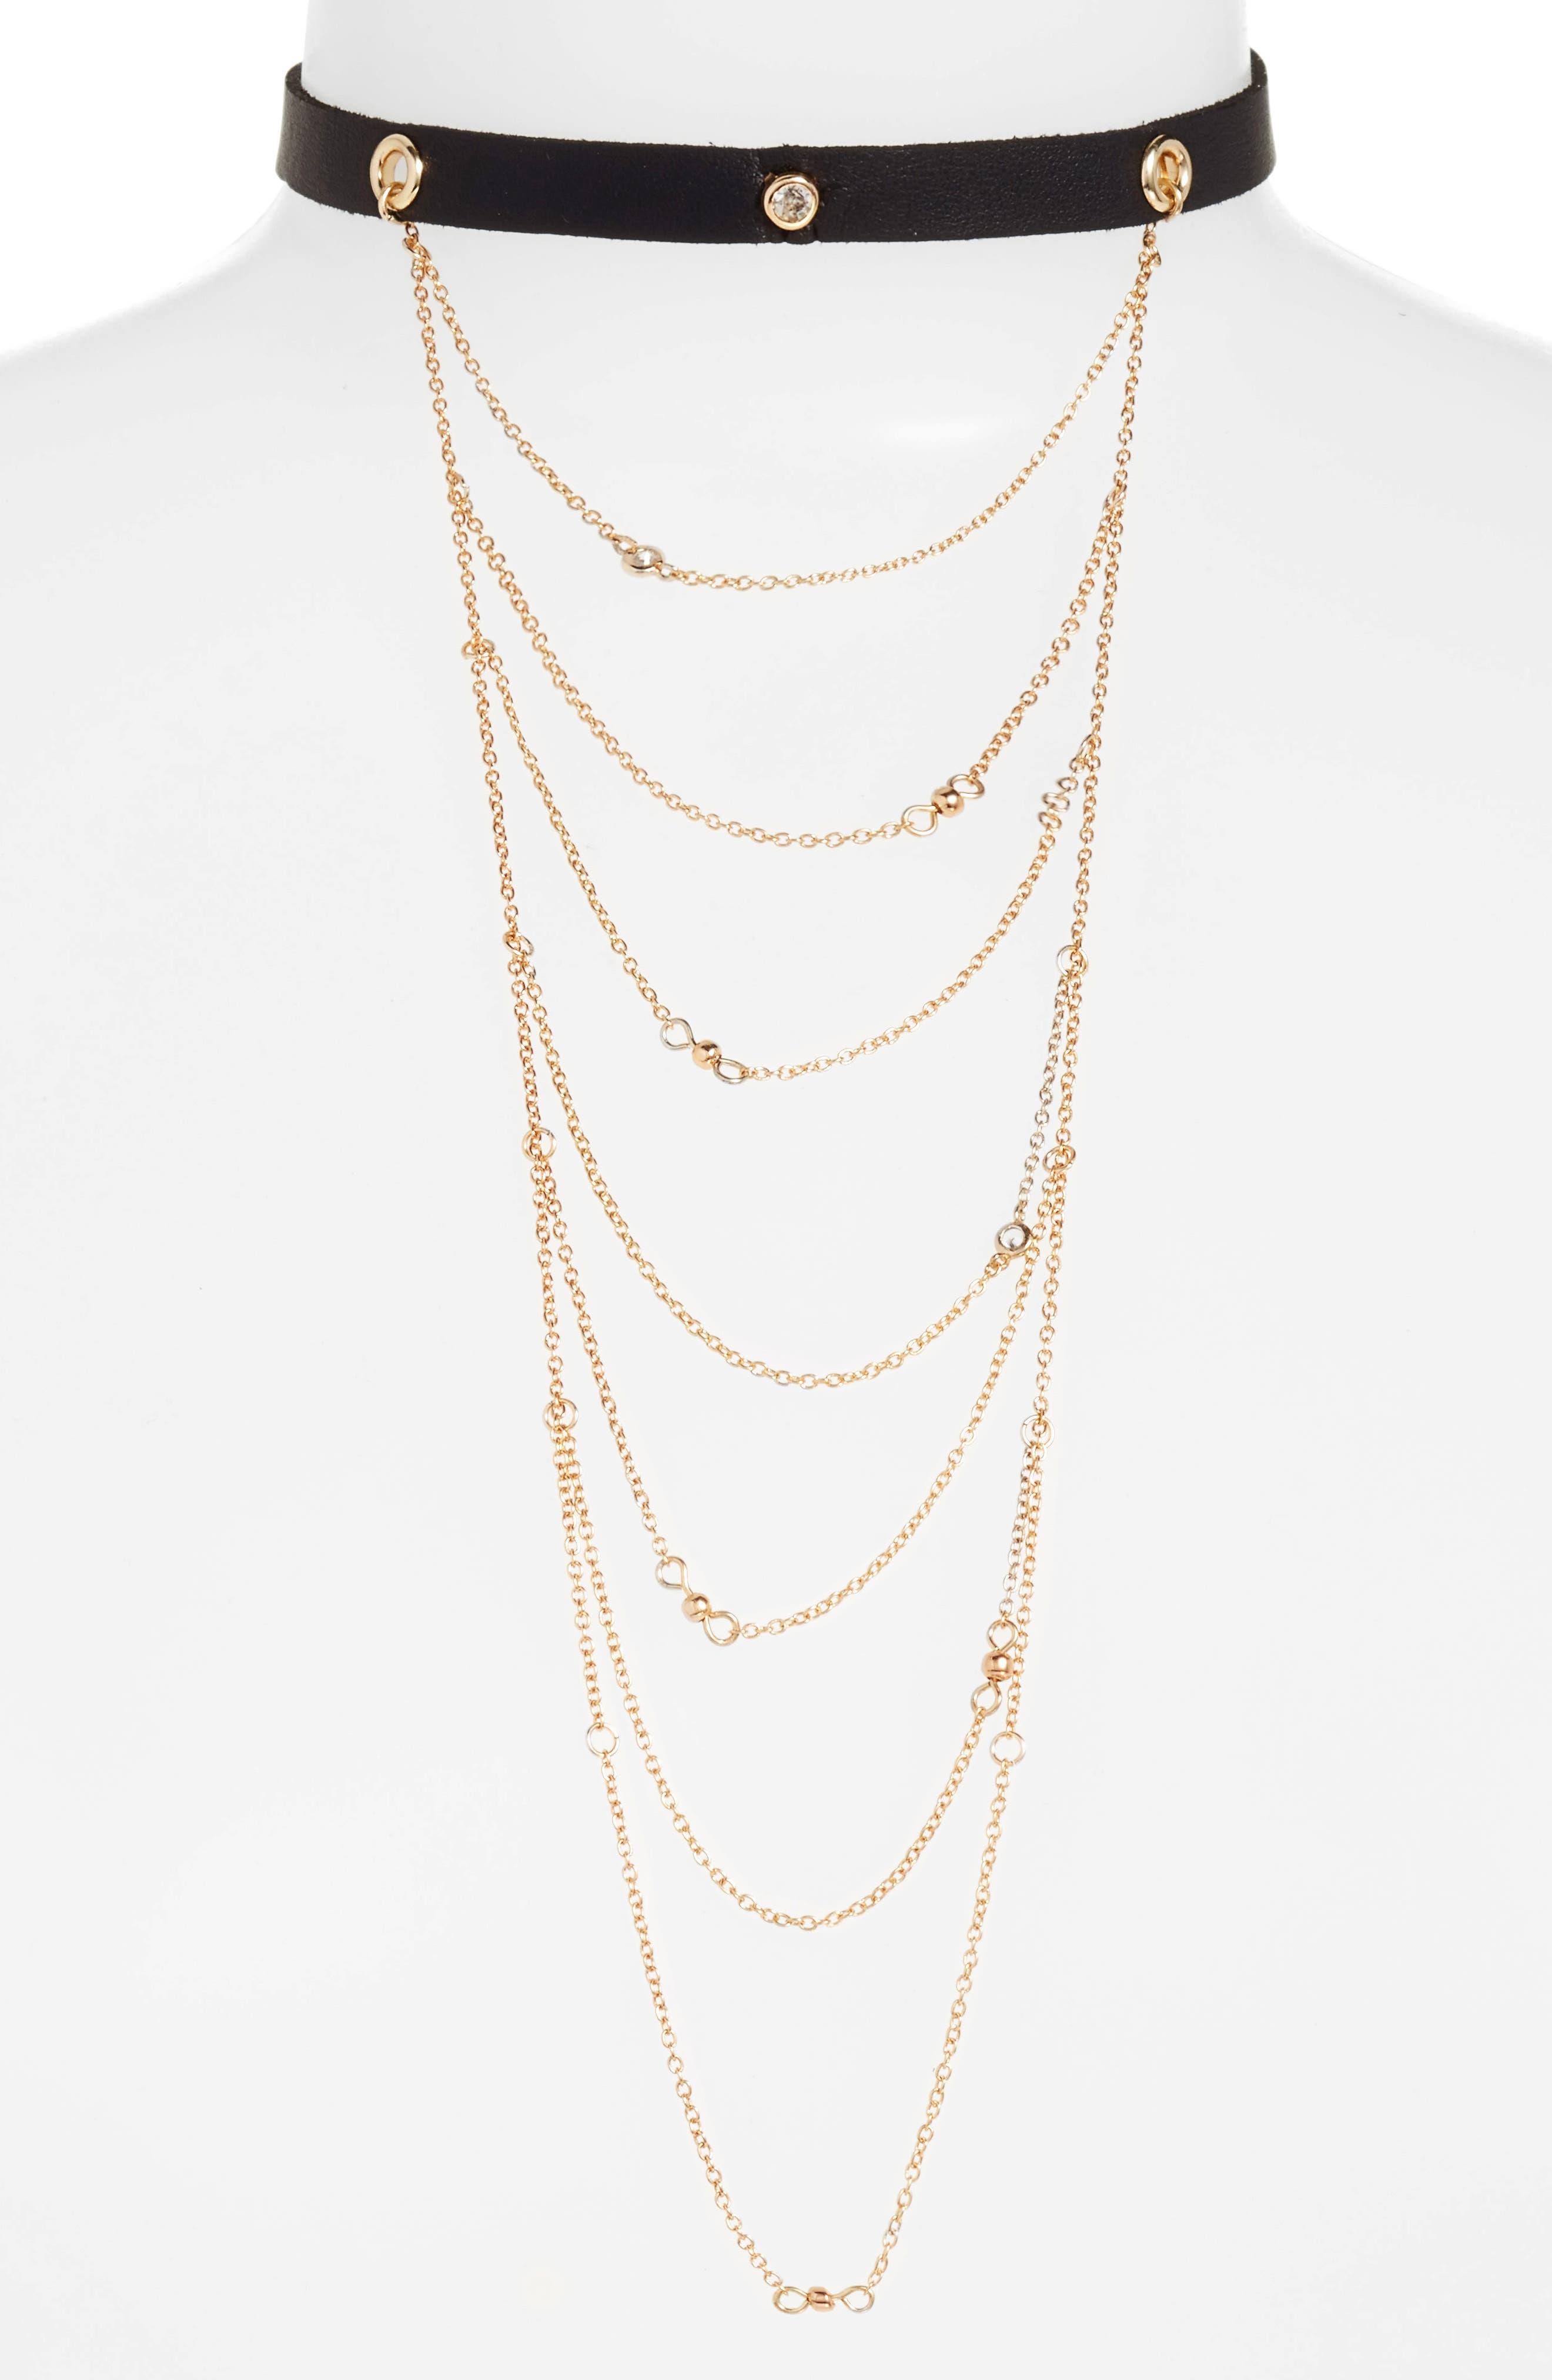 Main Image - Ettika Layered Chain & Leather Choker